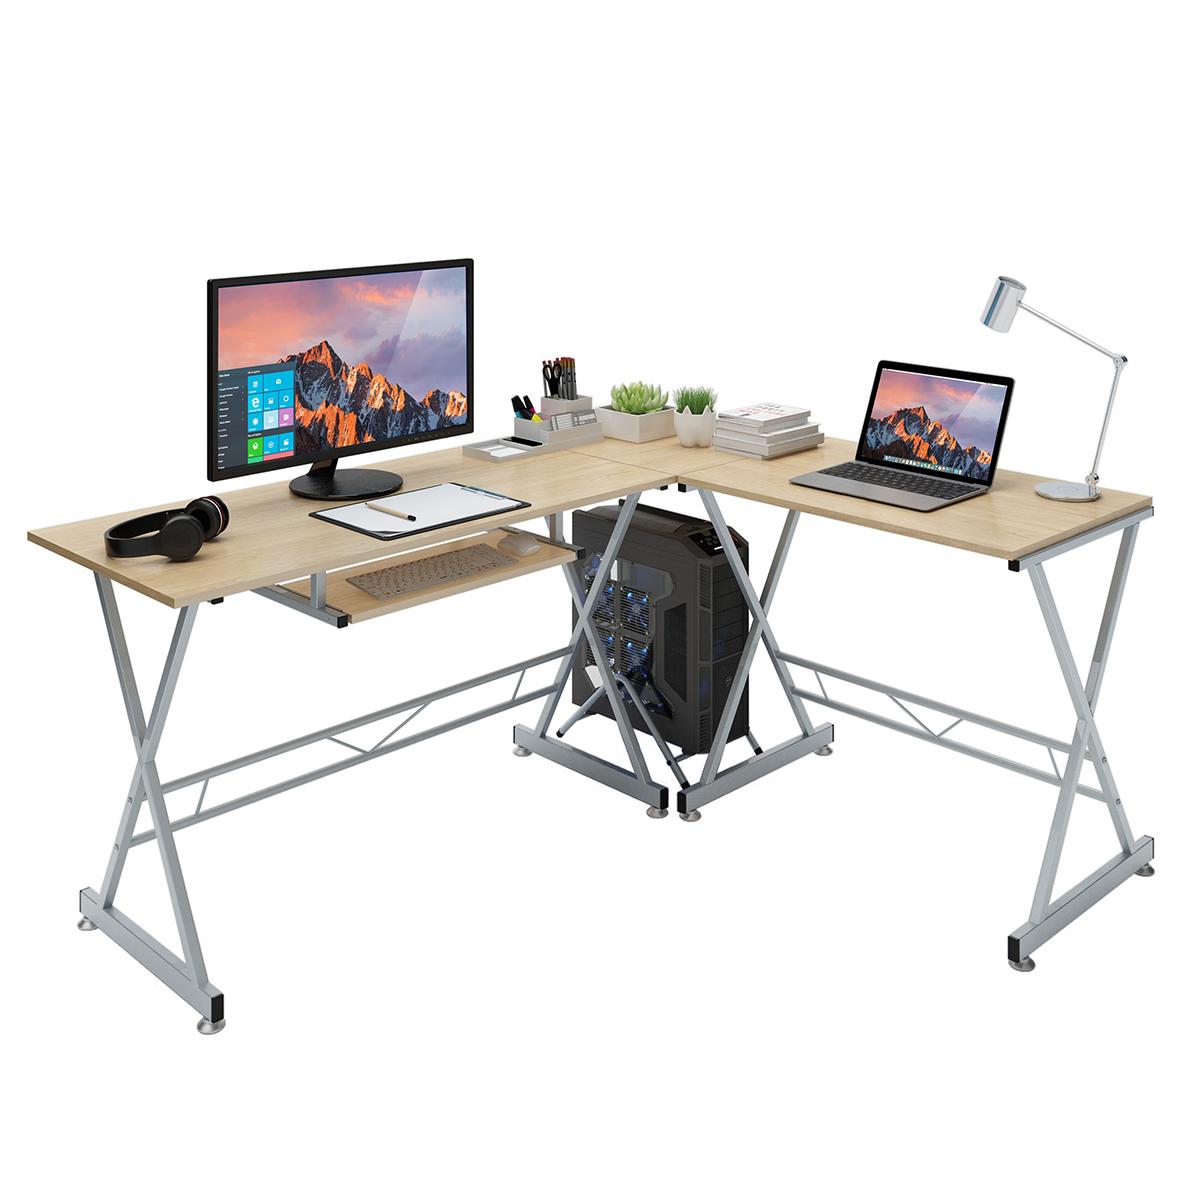 Slypnos L Shaped Corner Computer Desk Pc Gaming Table Laptop Study